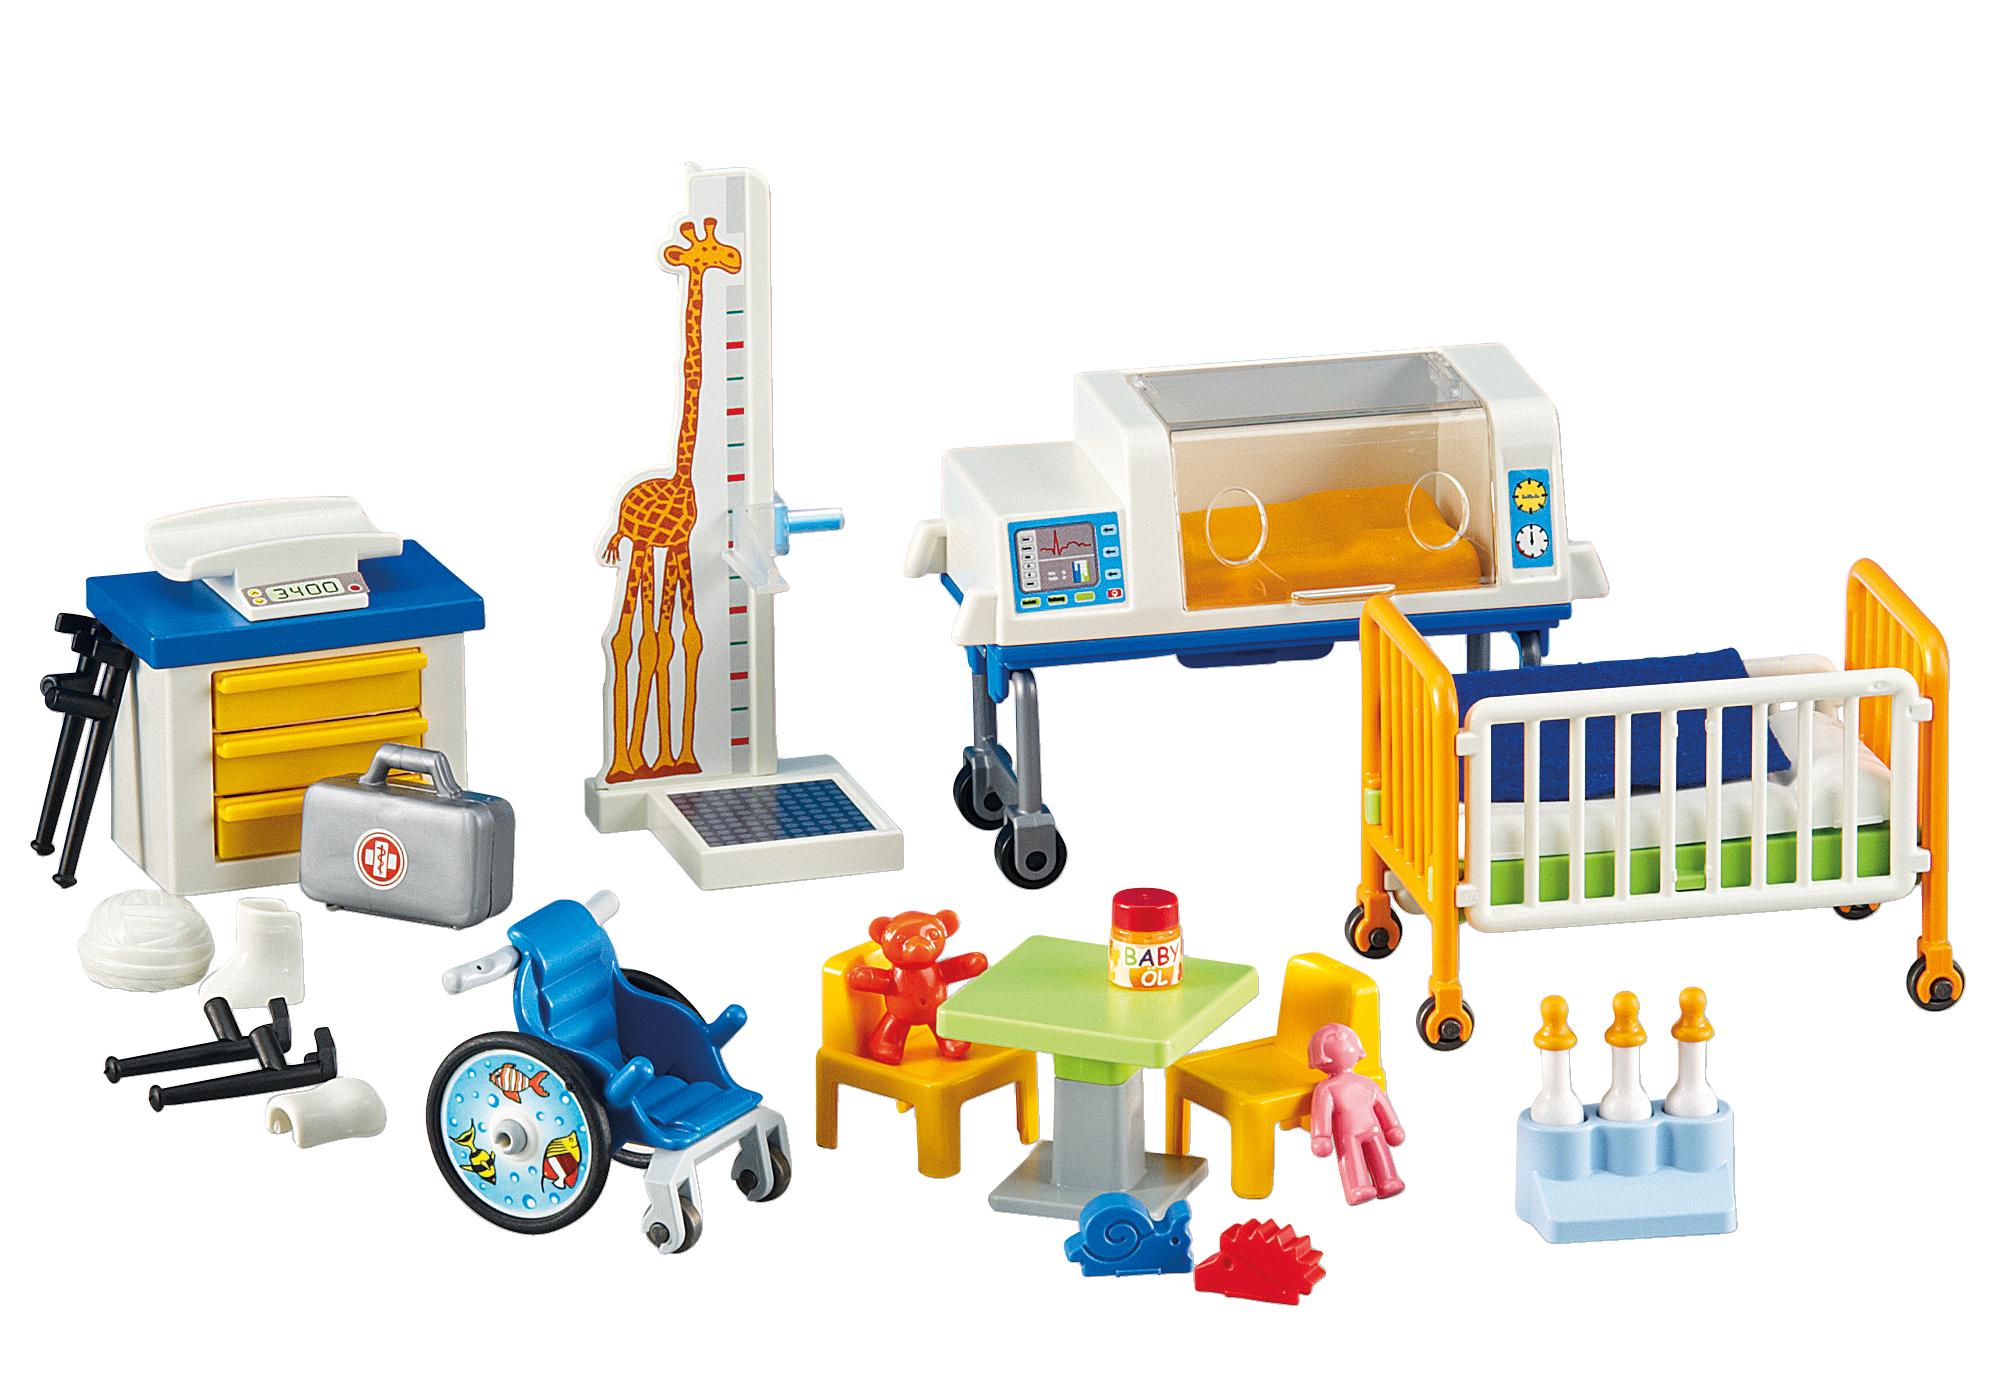 http://media.playmobil.com/i/playmobil/6295_product_detail/Kinderstation